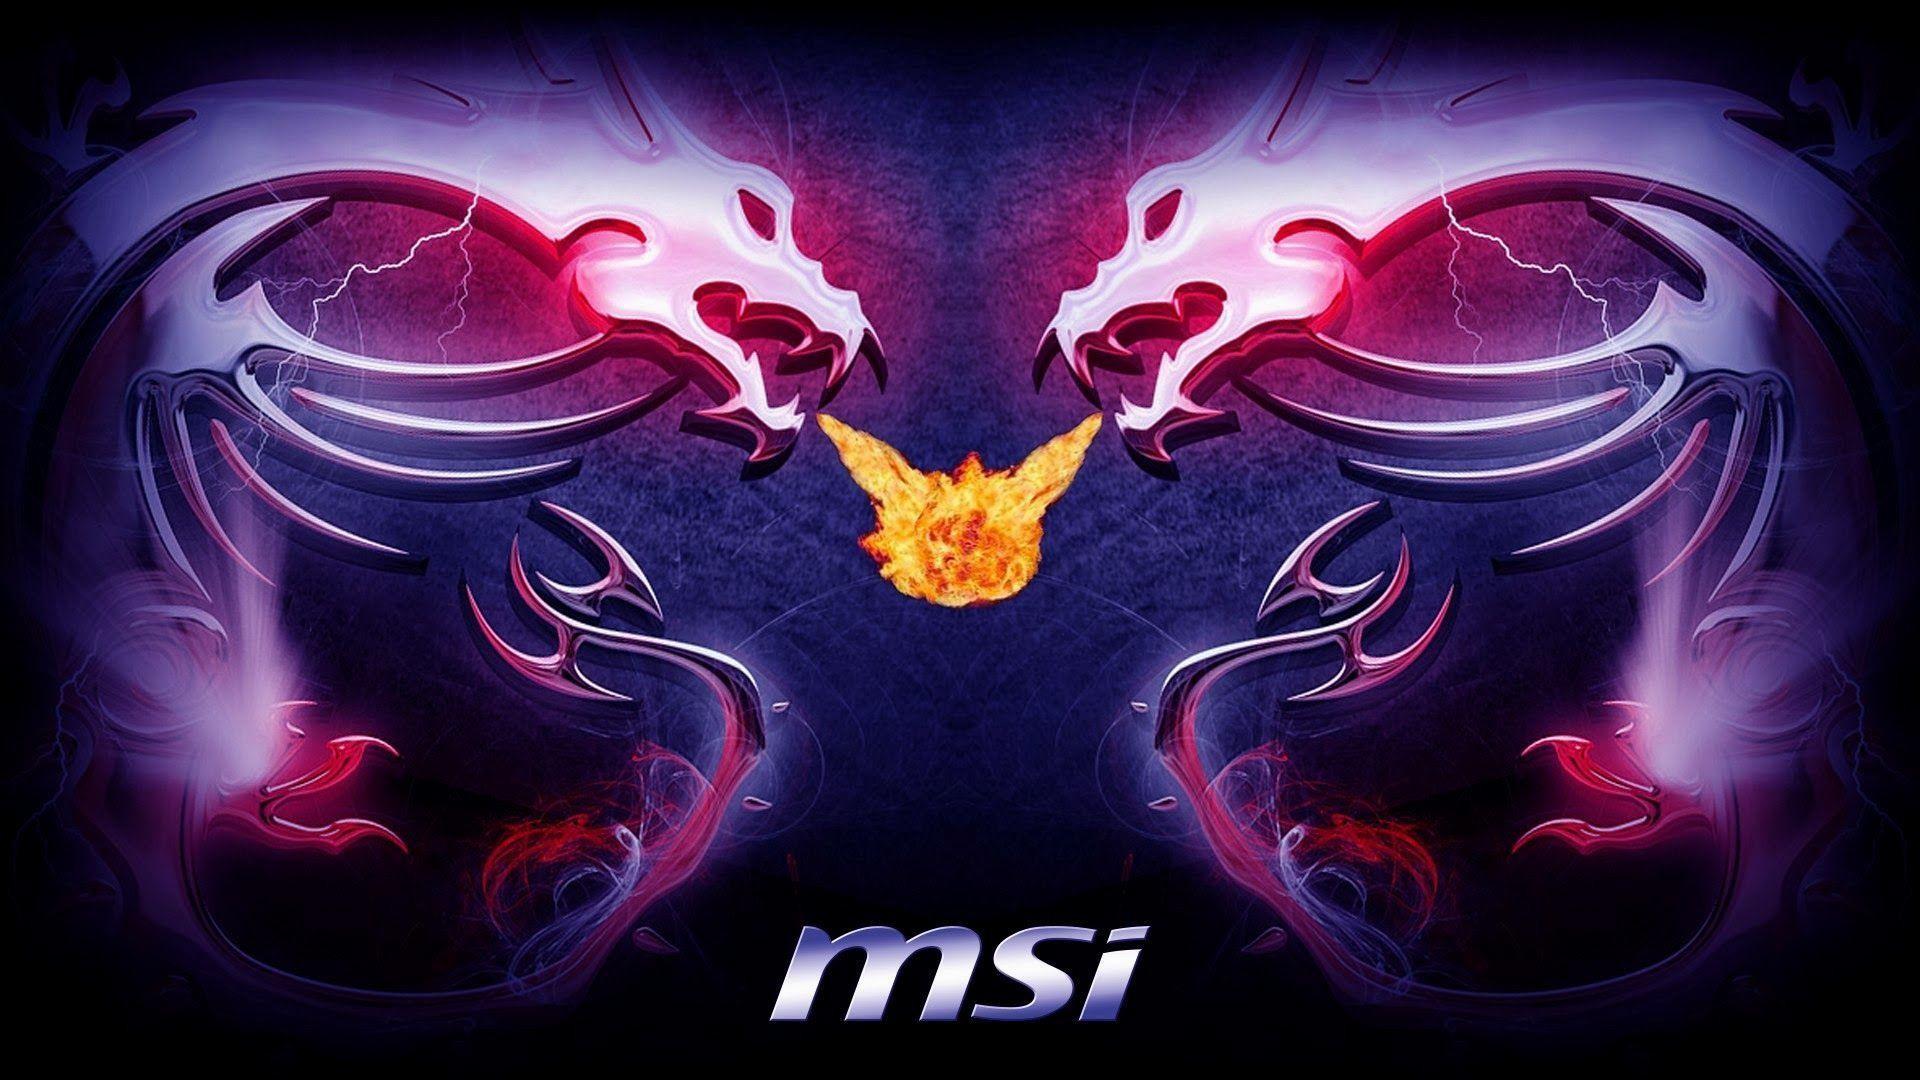 wallpaper.wiki-HD-Msi-Background-PIC-WPD001690